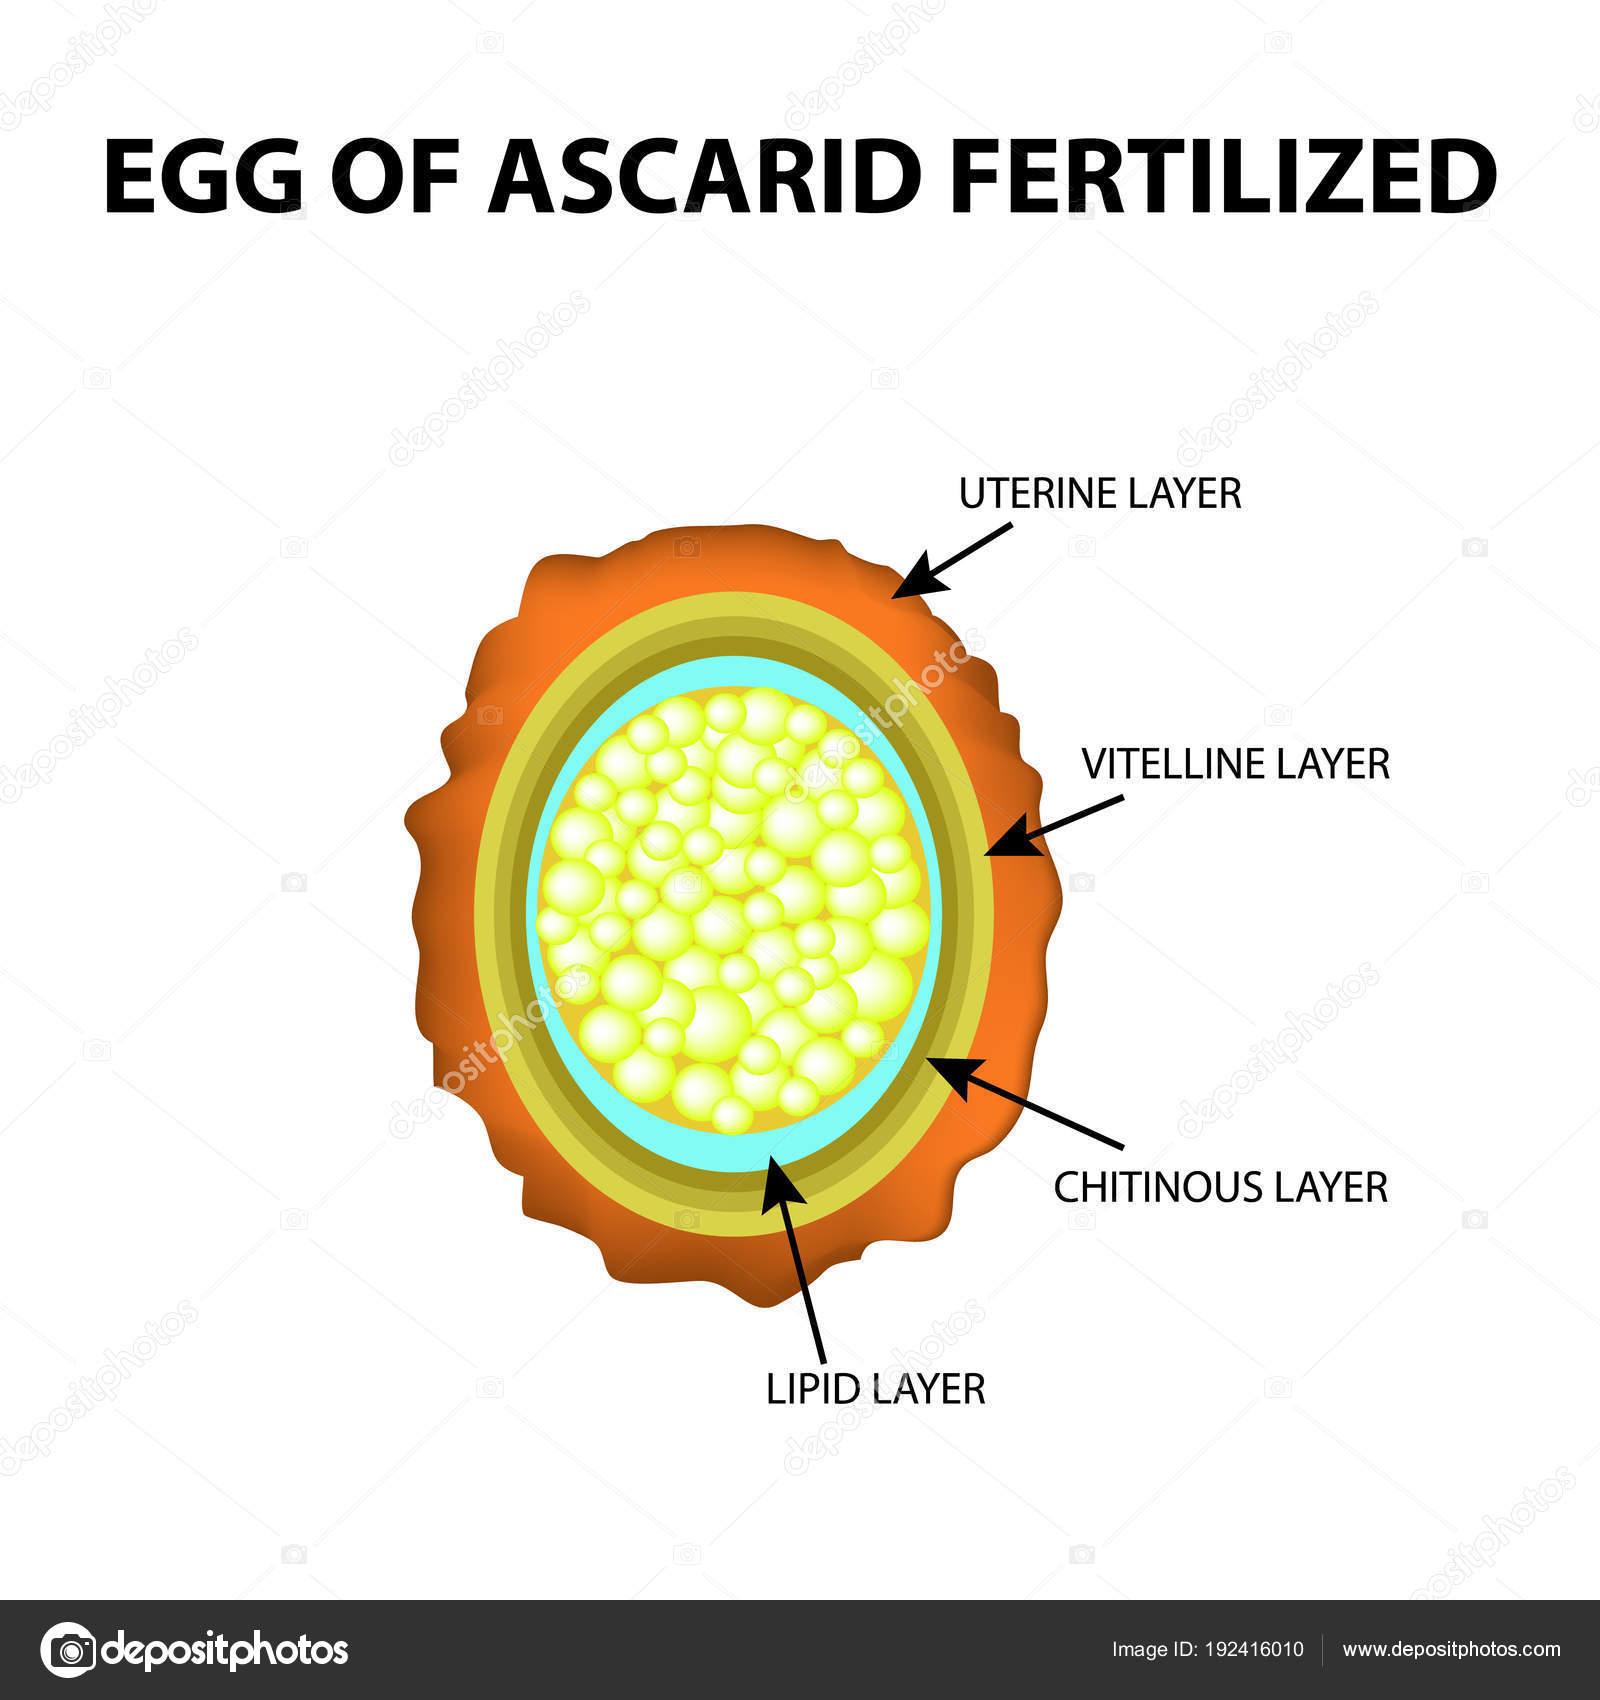 Helminth tojások fajai, A tojás fajtái